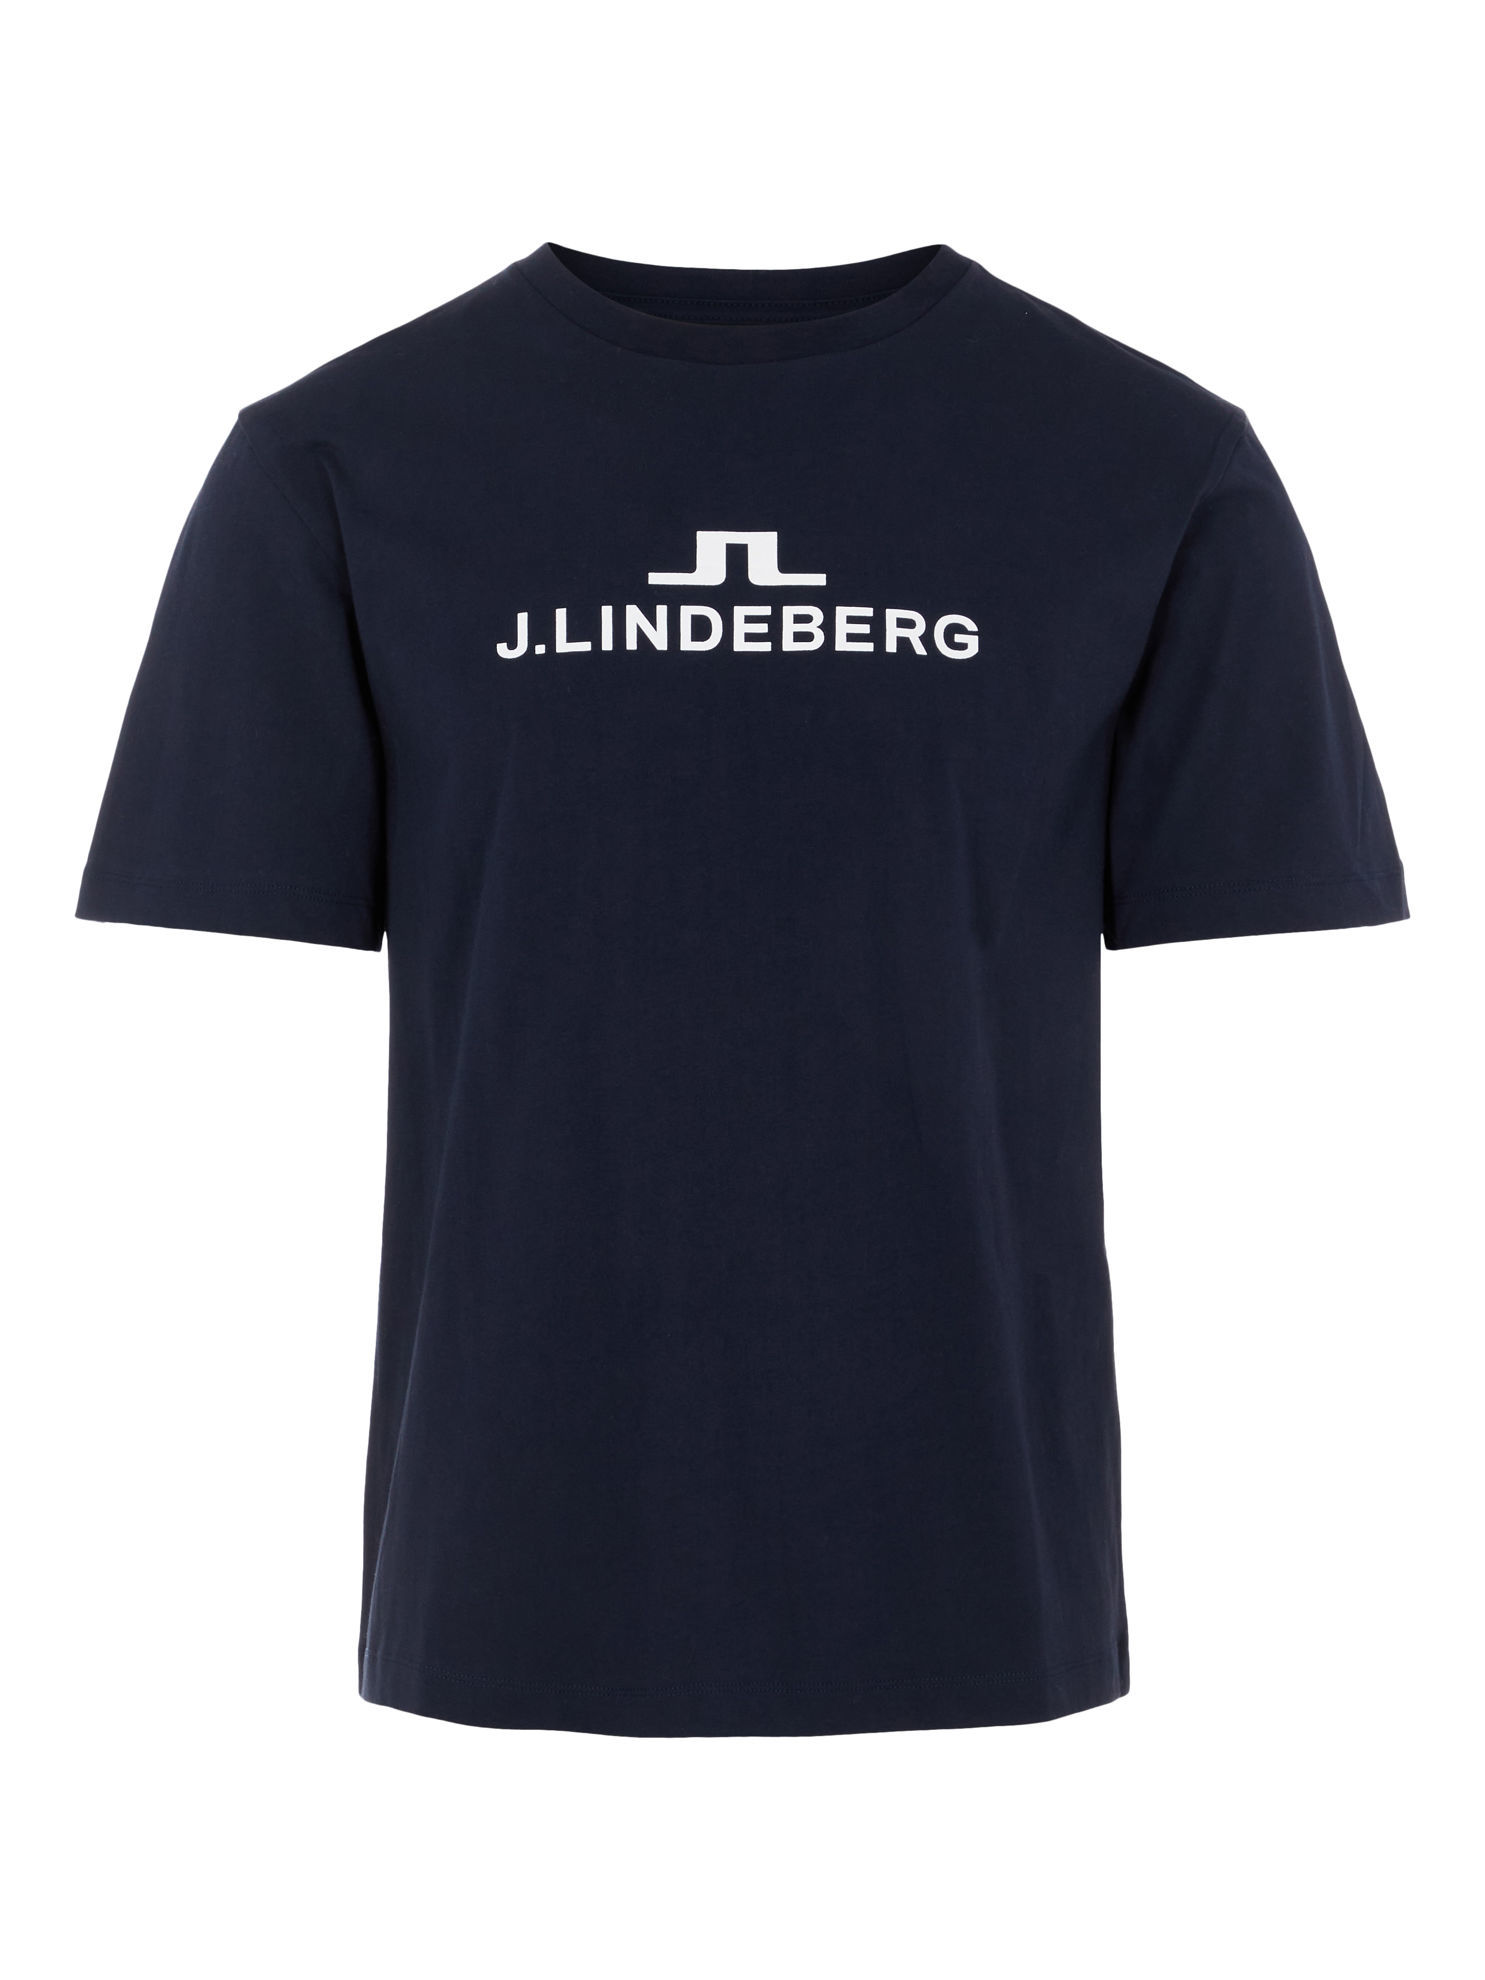 Bilde av J.Lindeberg Alpha t-shirt SMJS04326 6855 navy